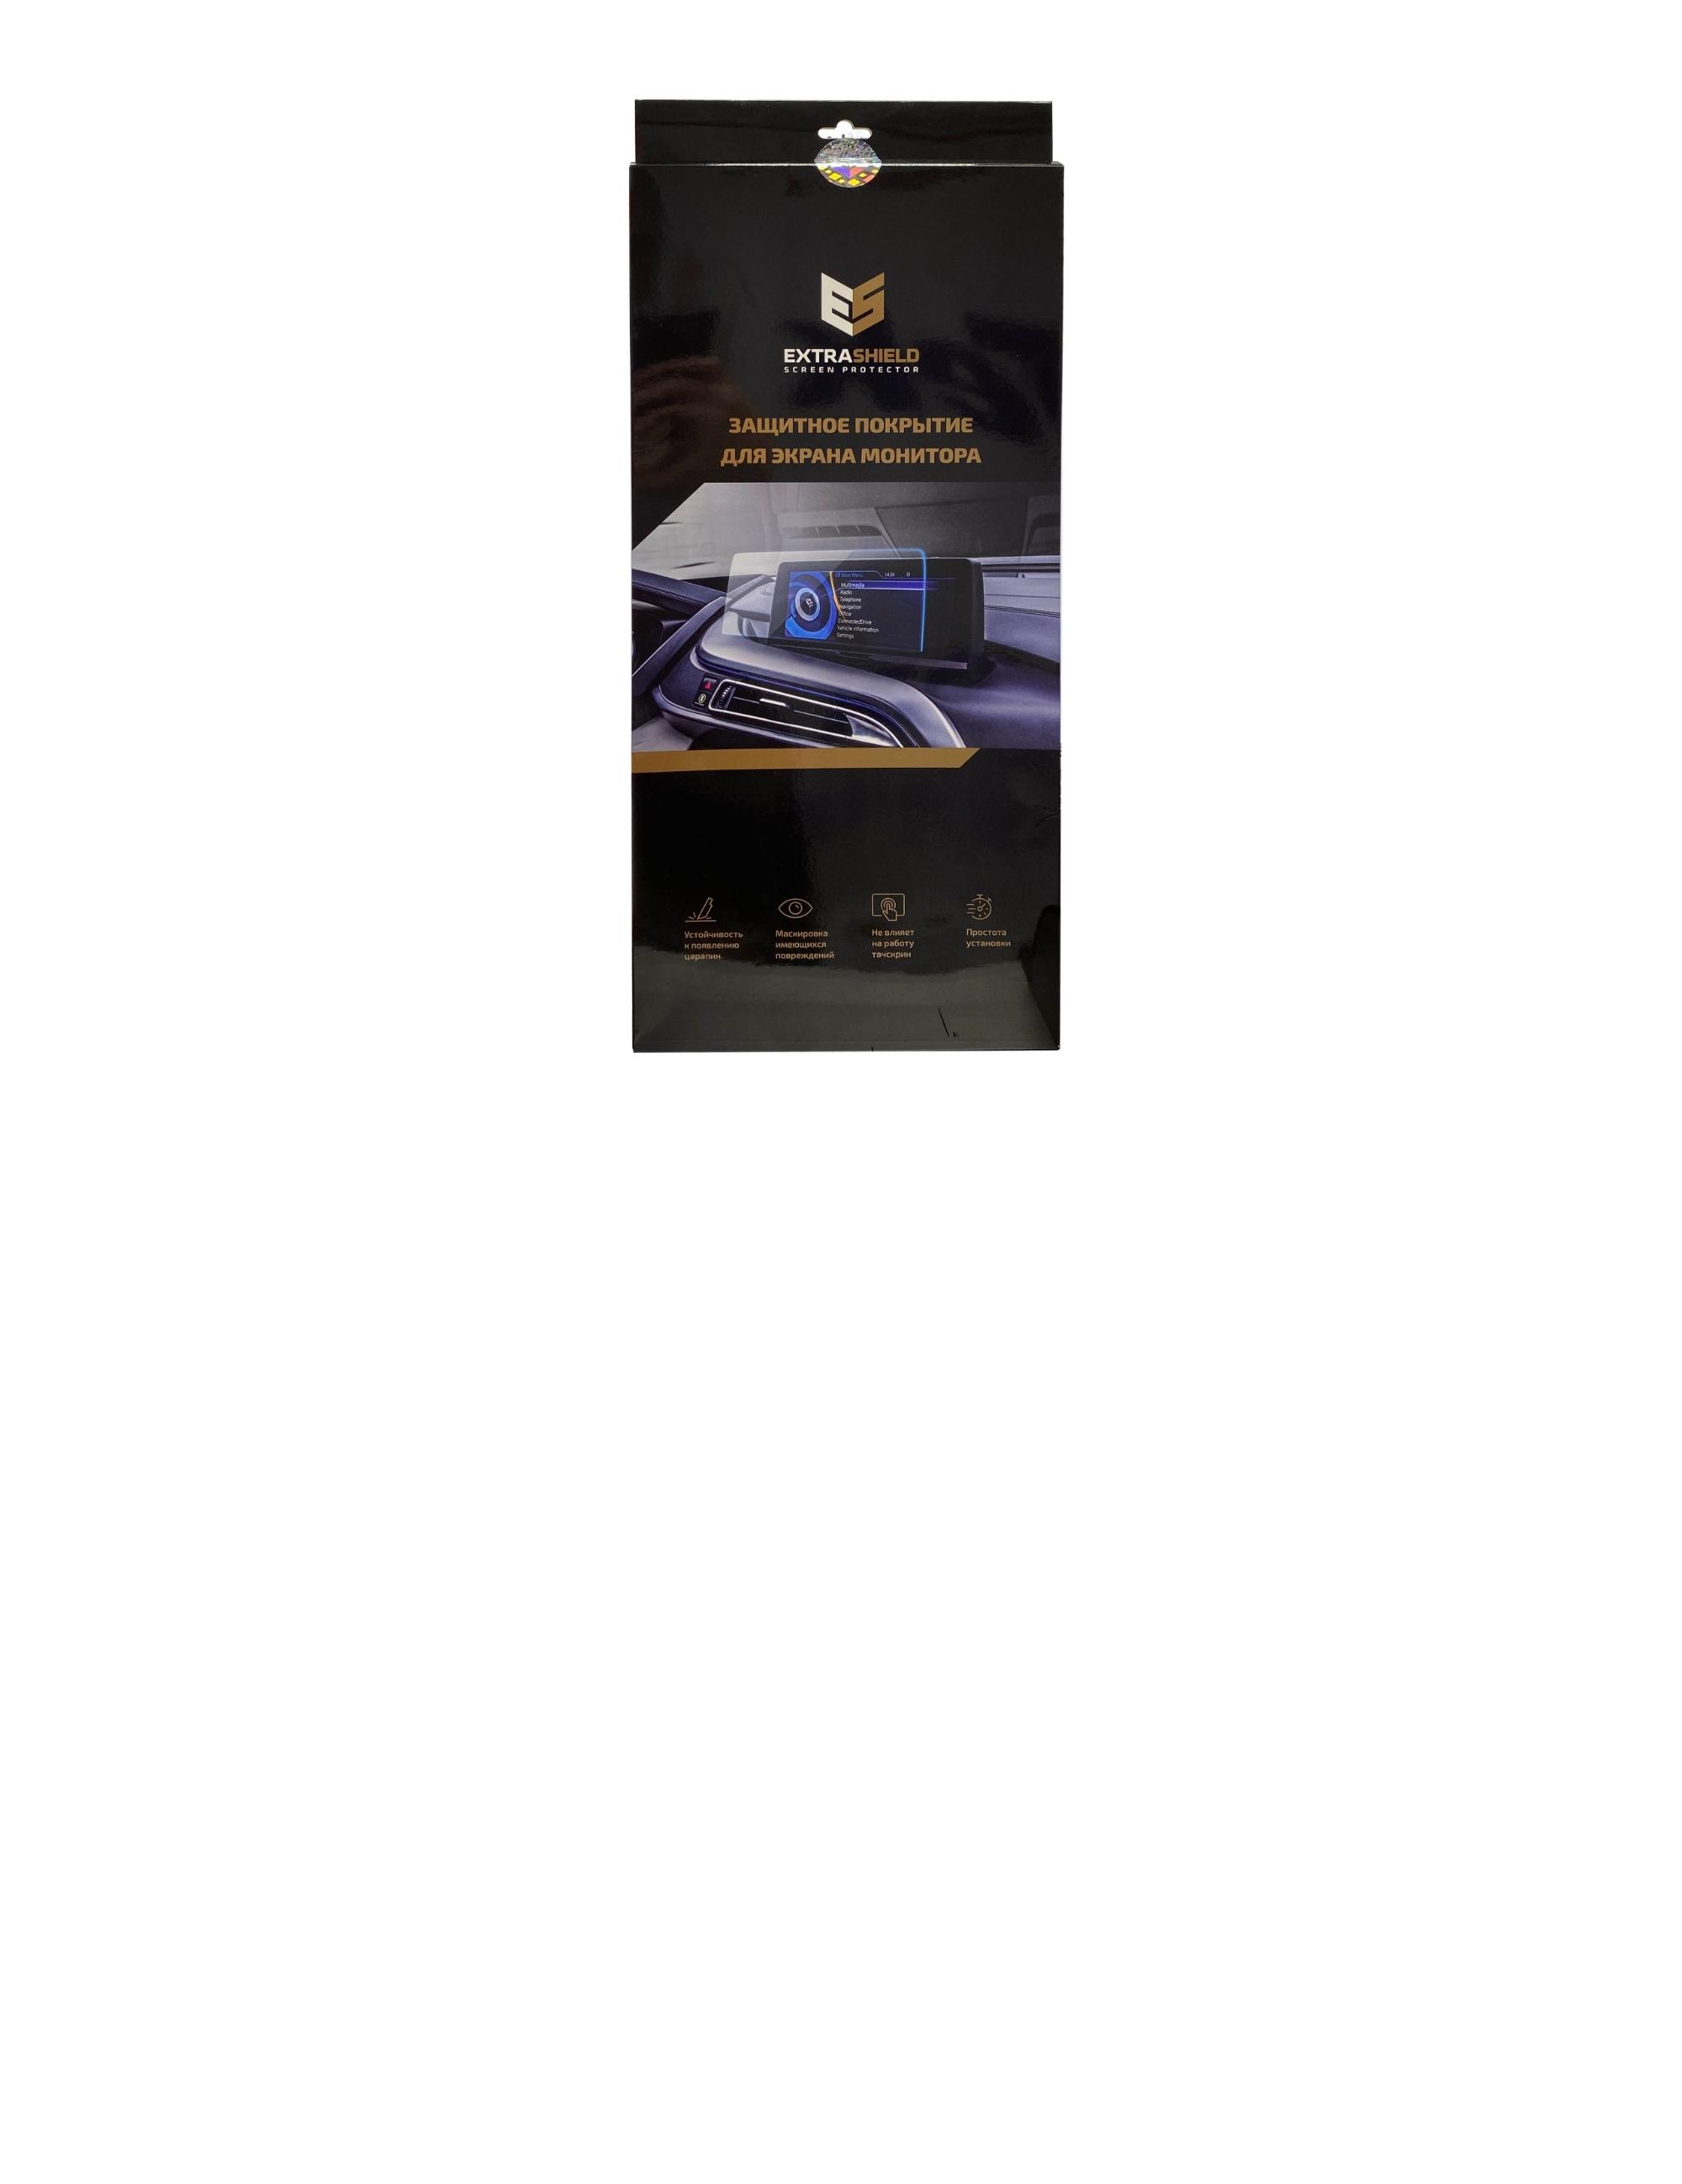 Audi A5 (F5) 2016 - н.в. мультимедиа MMI 7 Статическая пленка Глянец